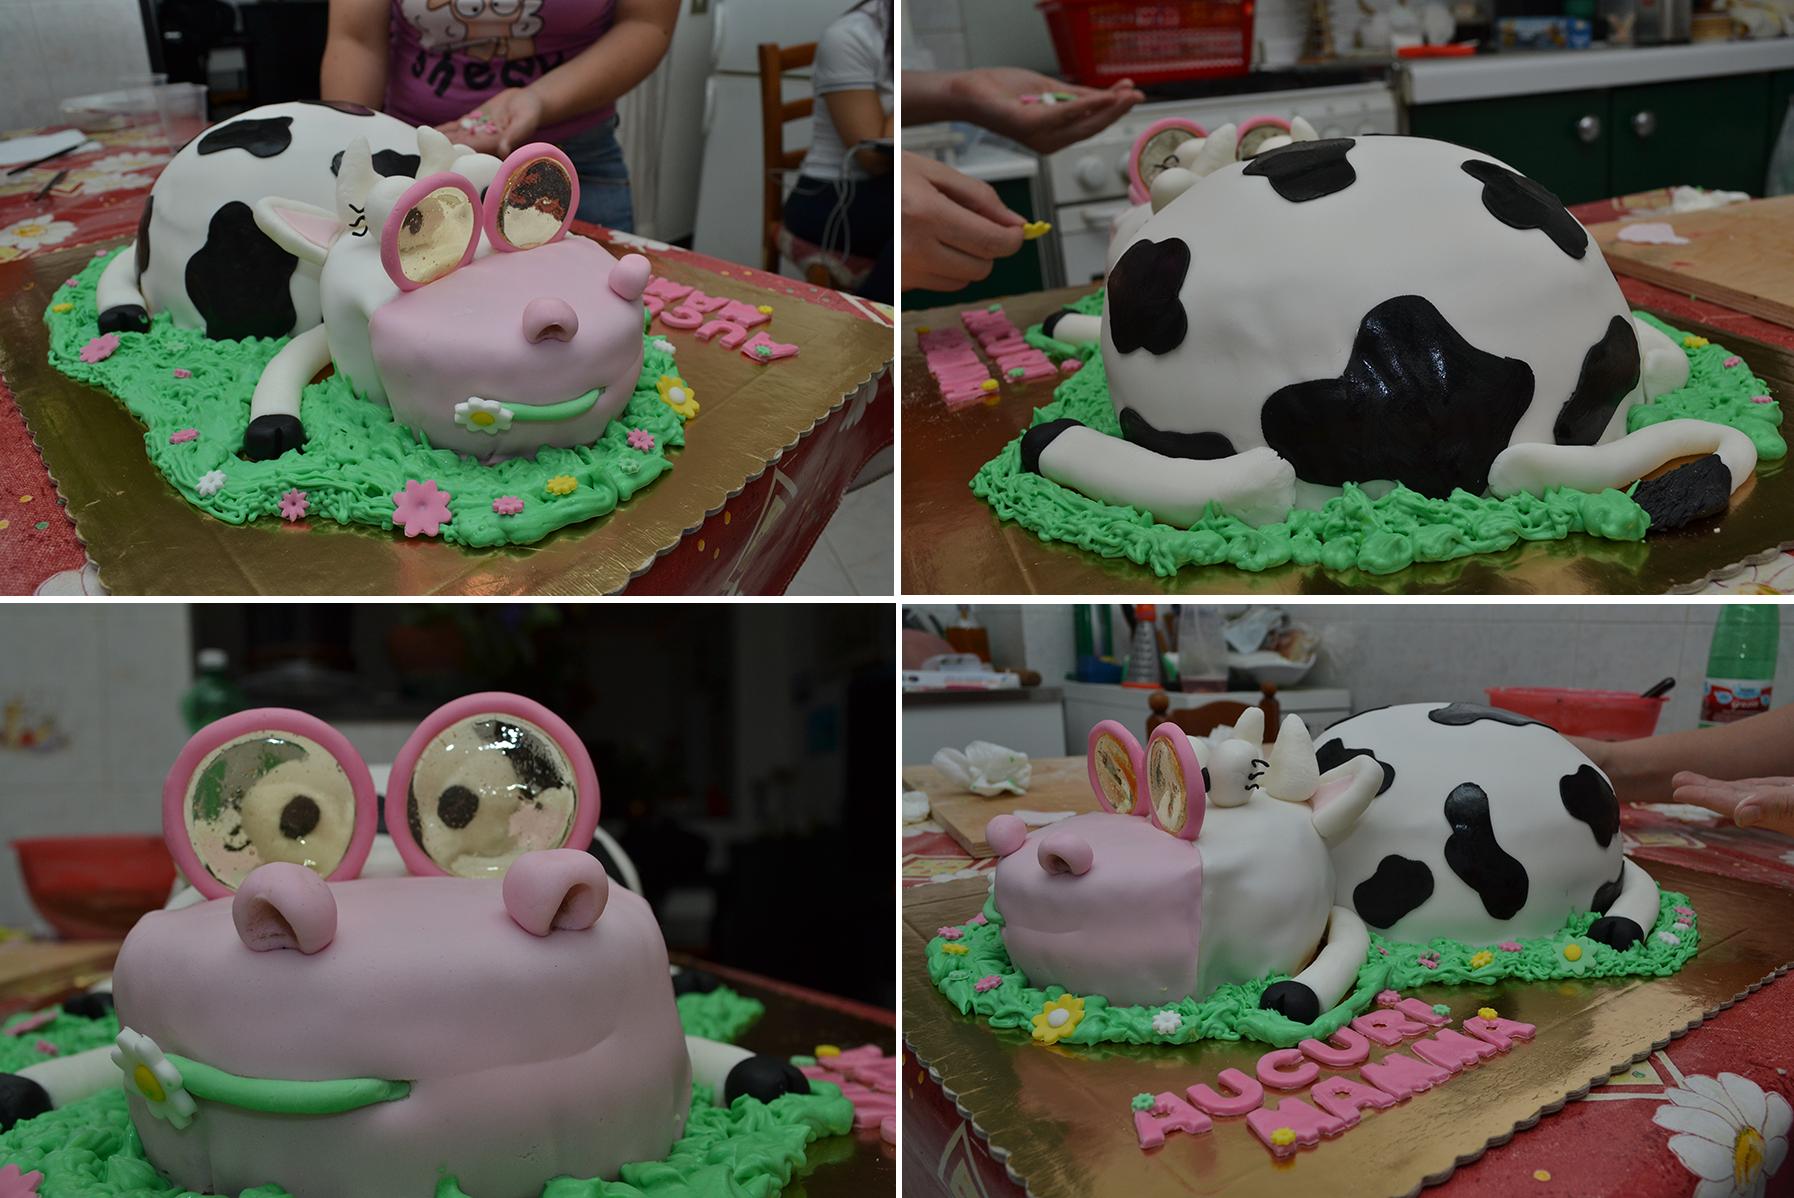 Art By Cow Cake : Cow Cake by JinKazama84 on deviantART